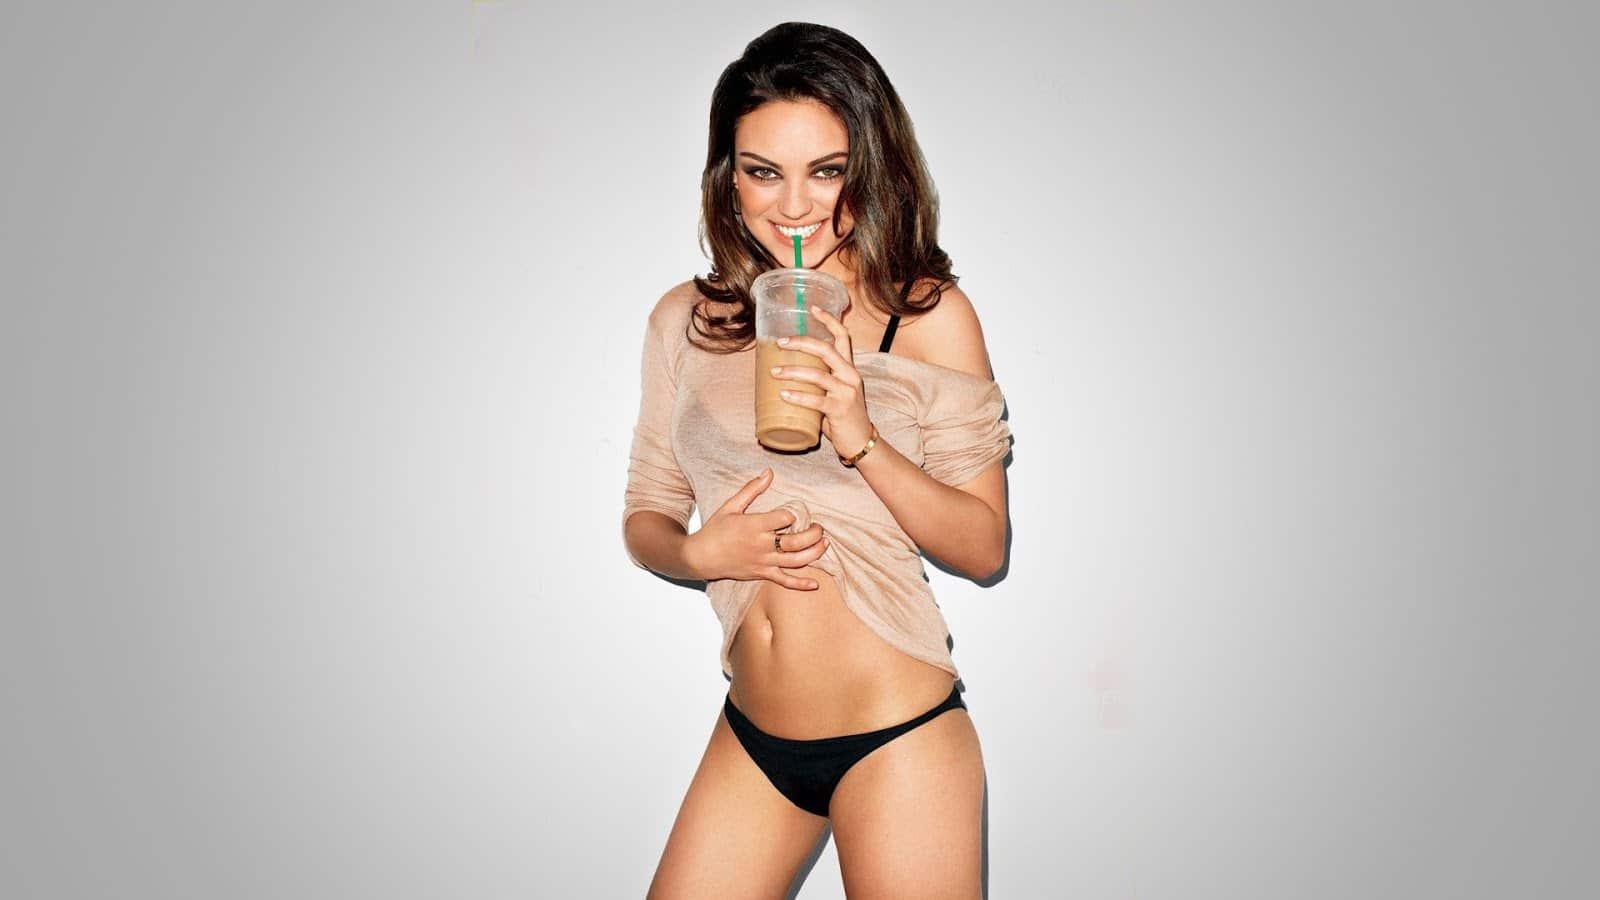 Mila Kunis nude pic